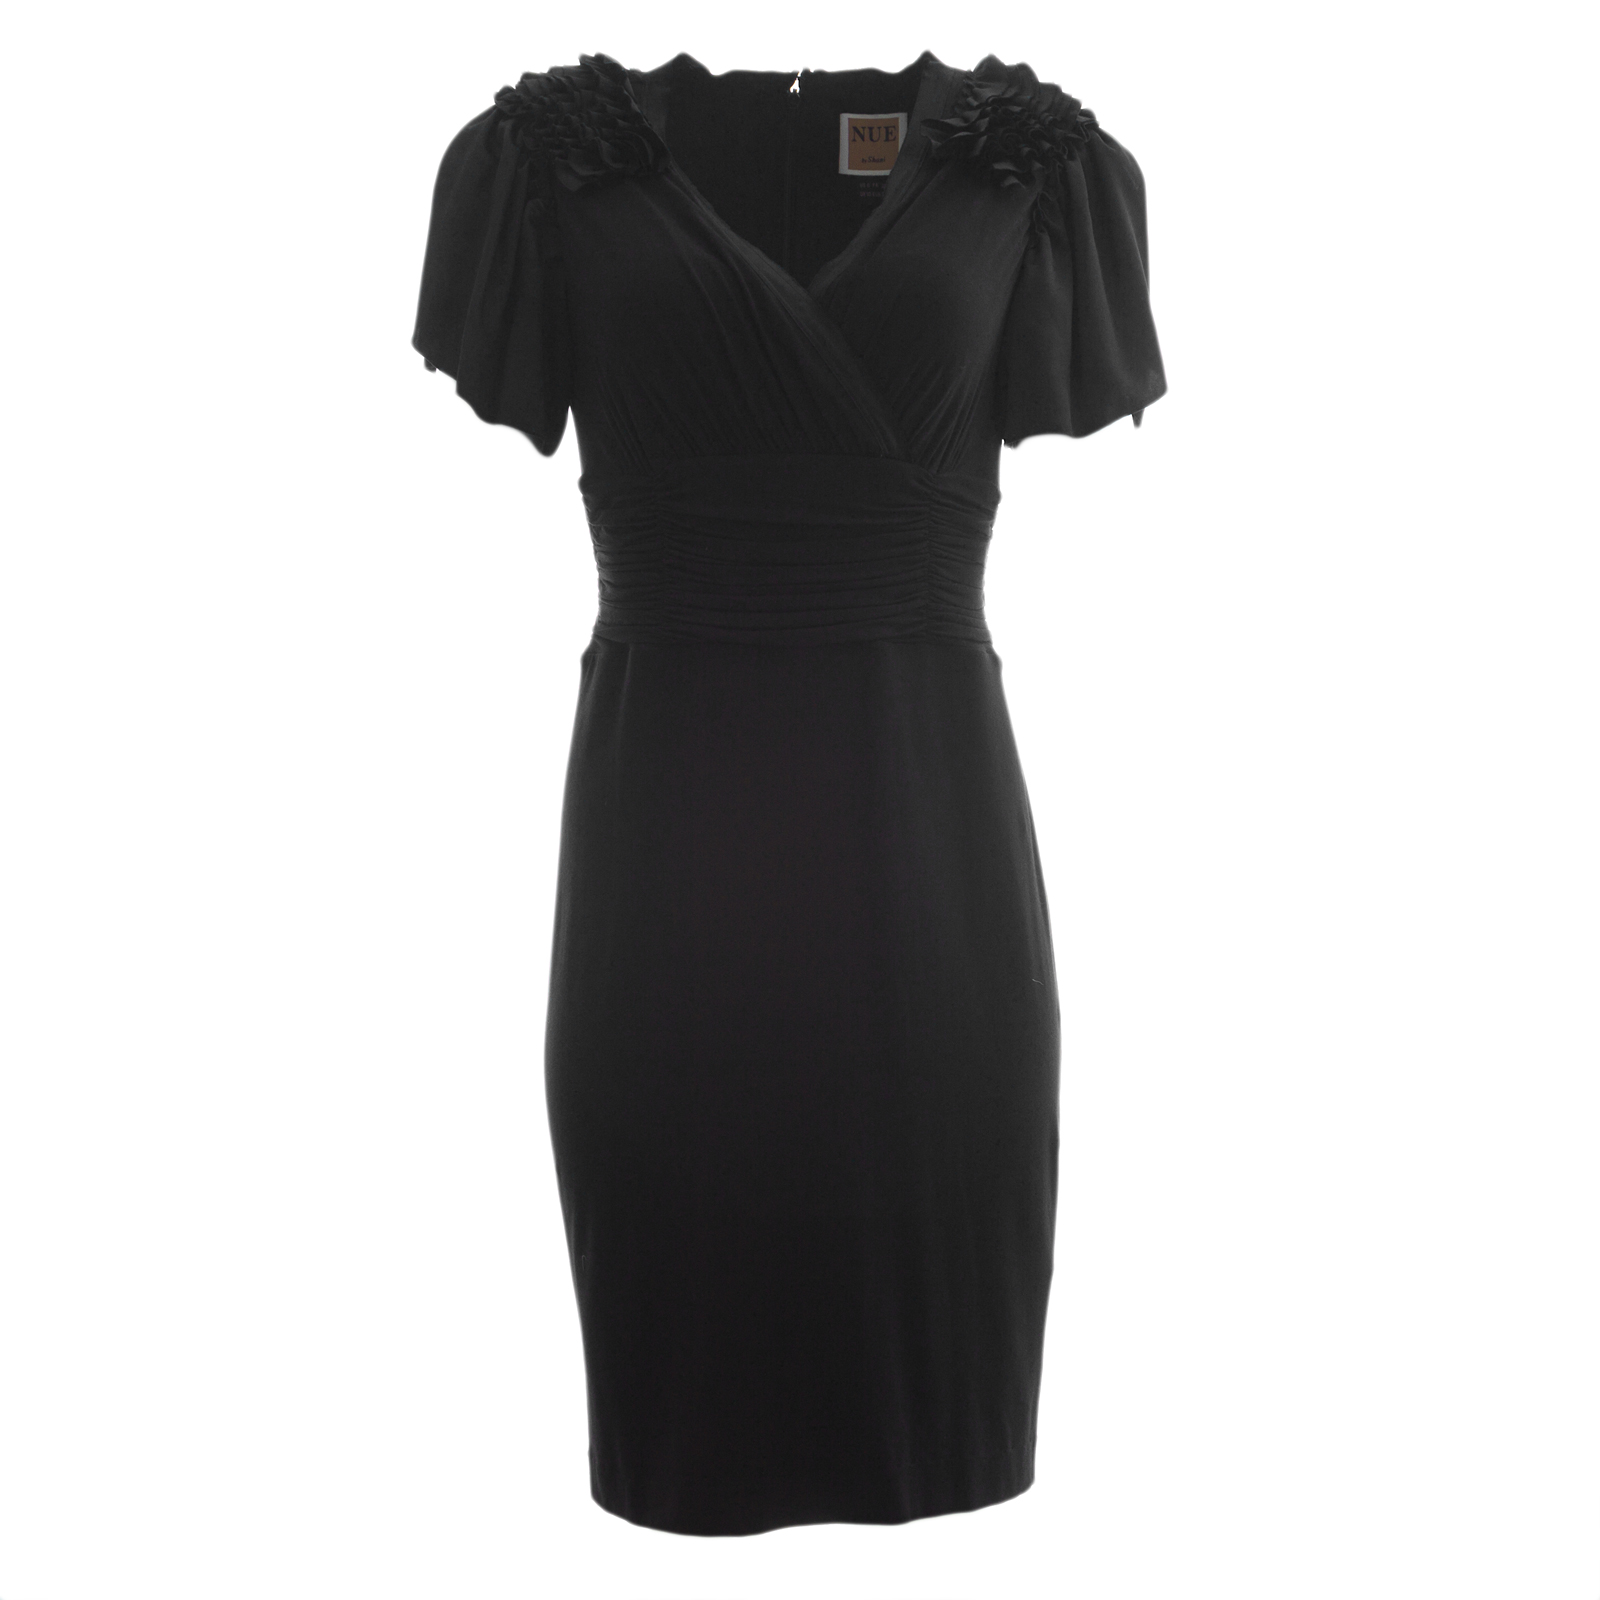 5247f6b458 NUE by Shani Women s Black Flutter Sleeve Cocktail Dress S457 Sz 2  280 NWT